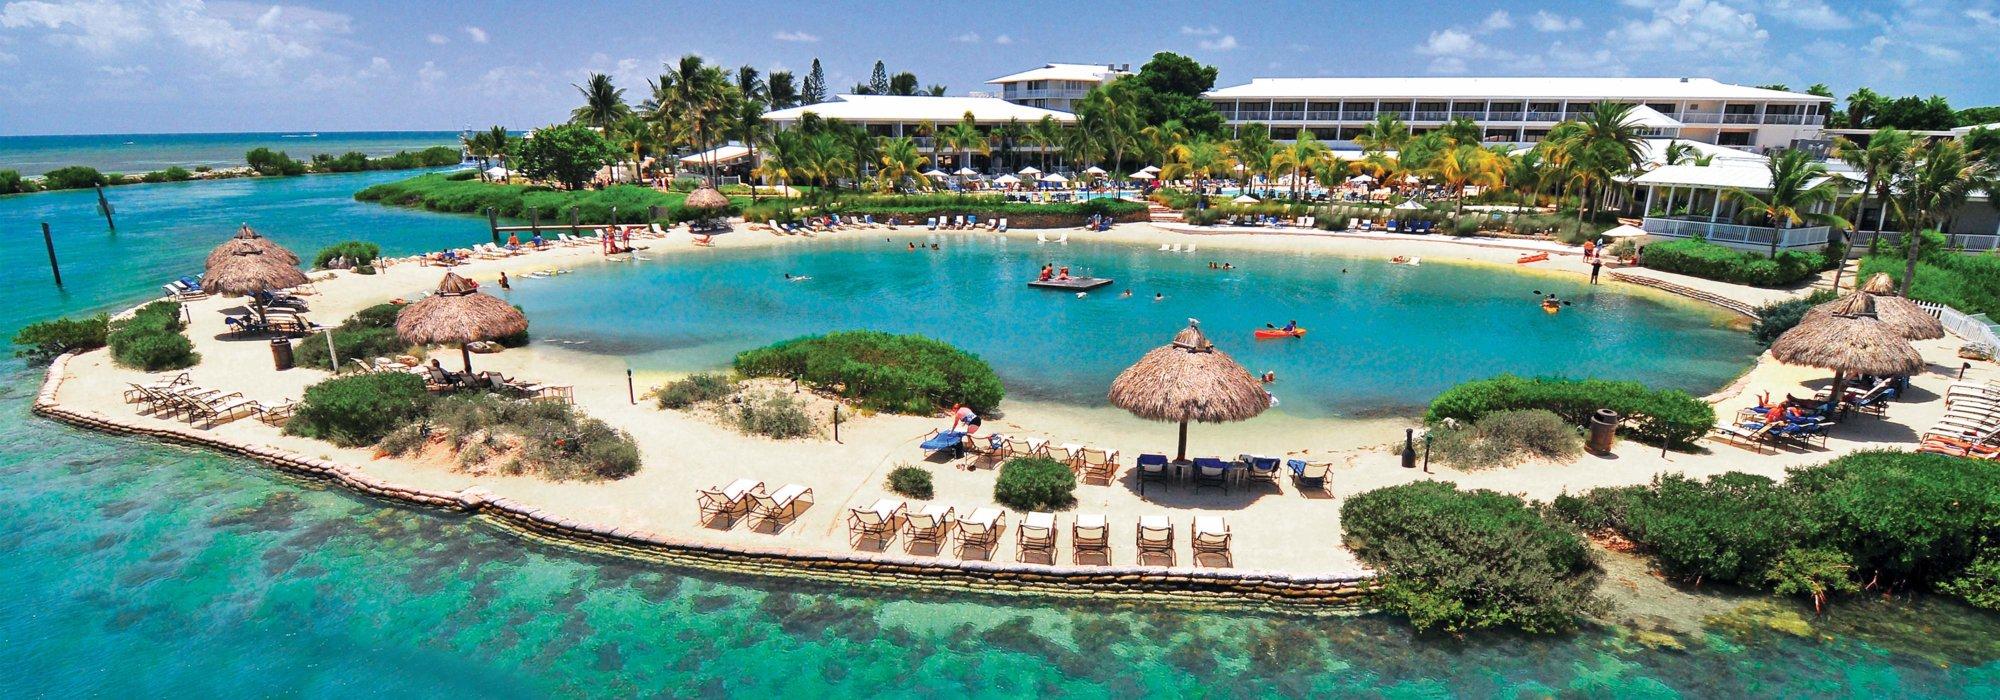 Hawks Cay landing-page-4000x1400-lagoon-01.jpg